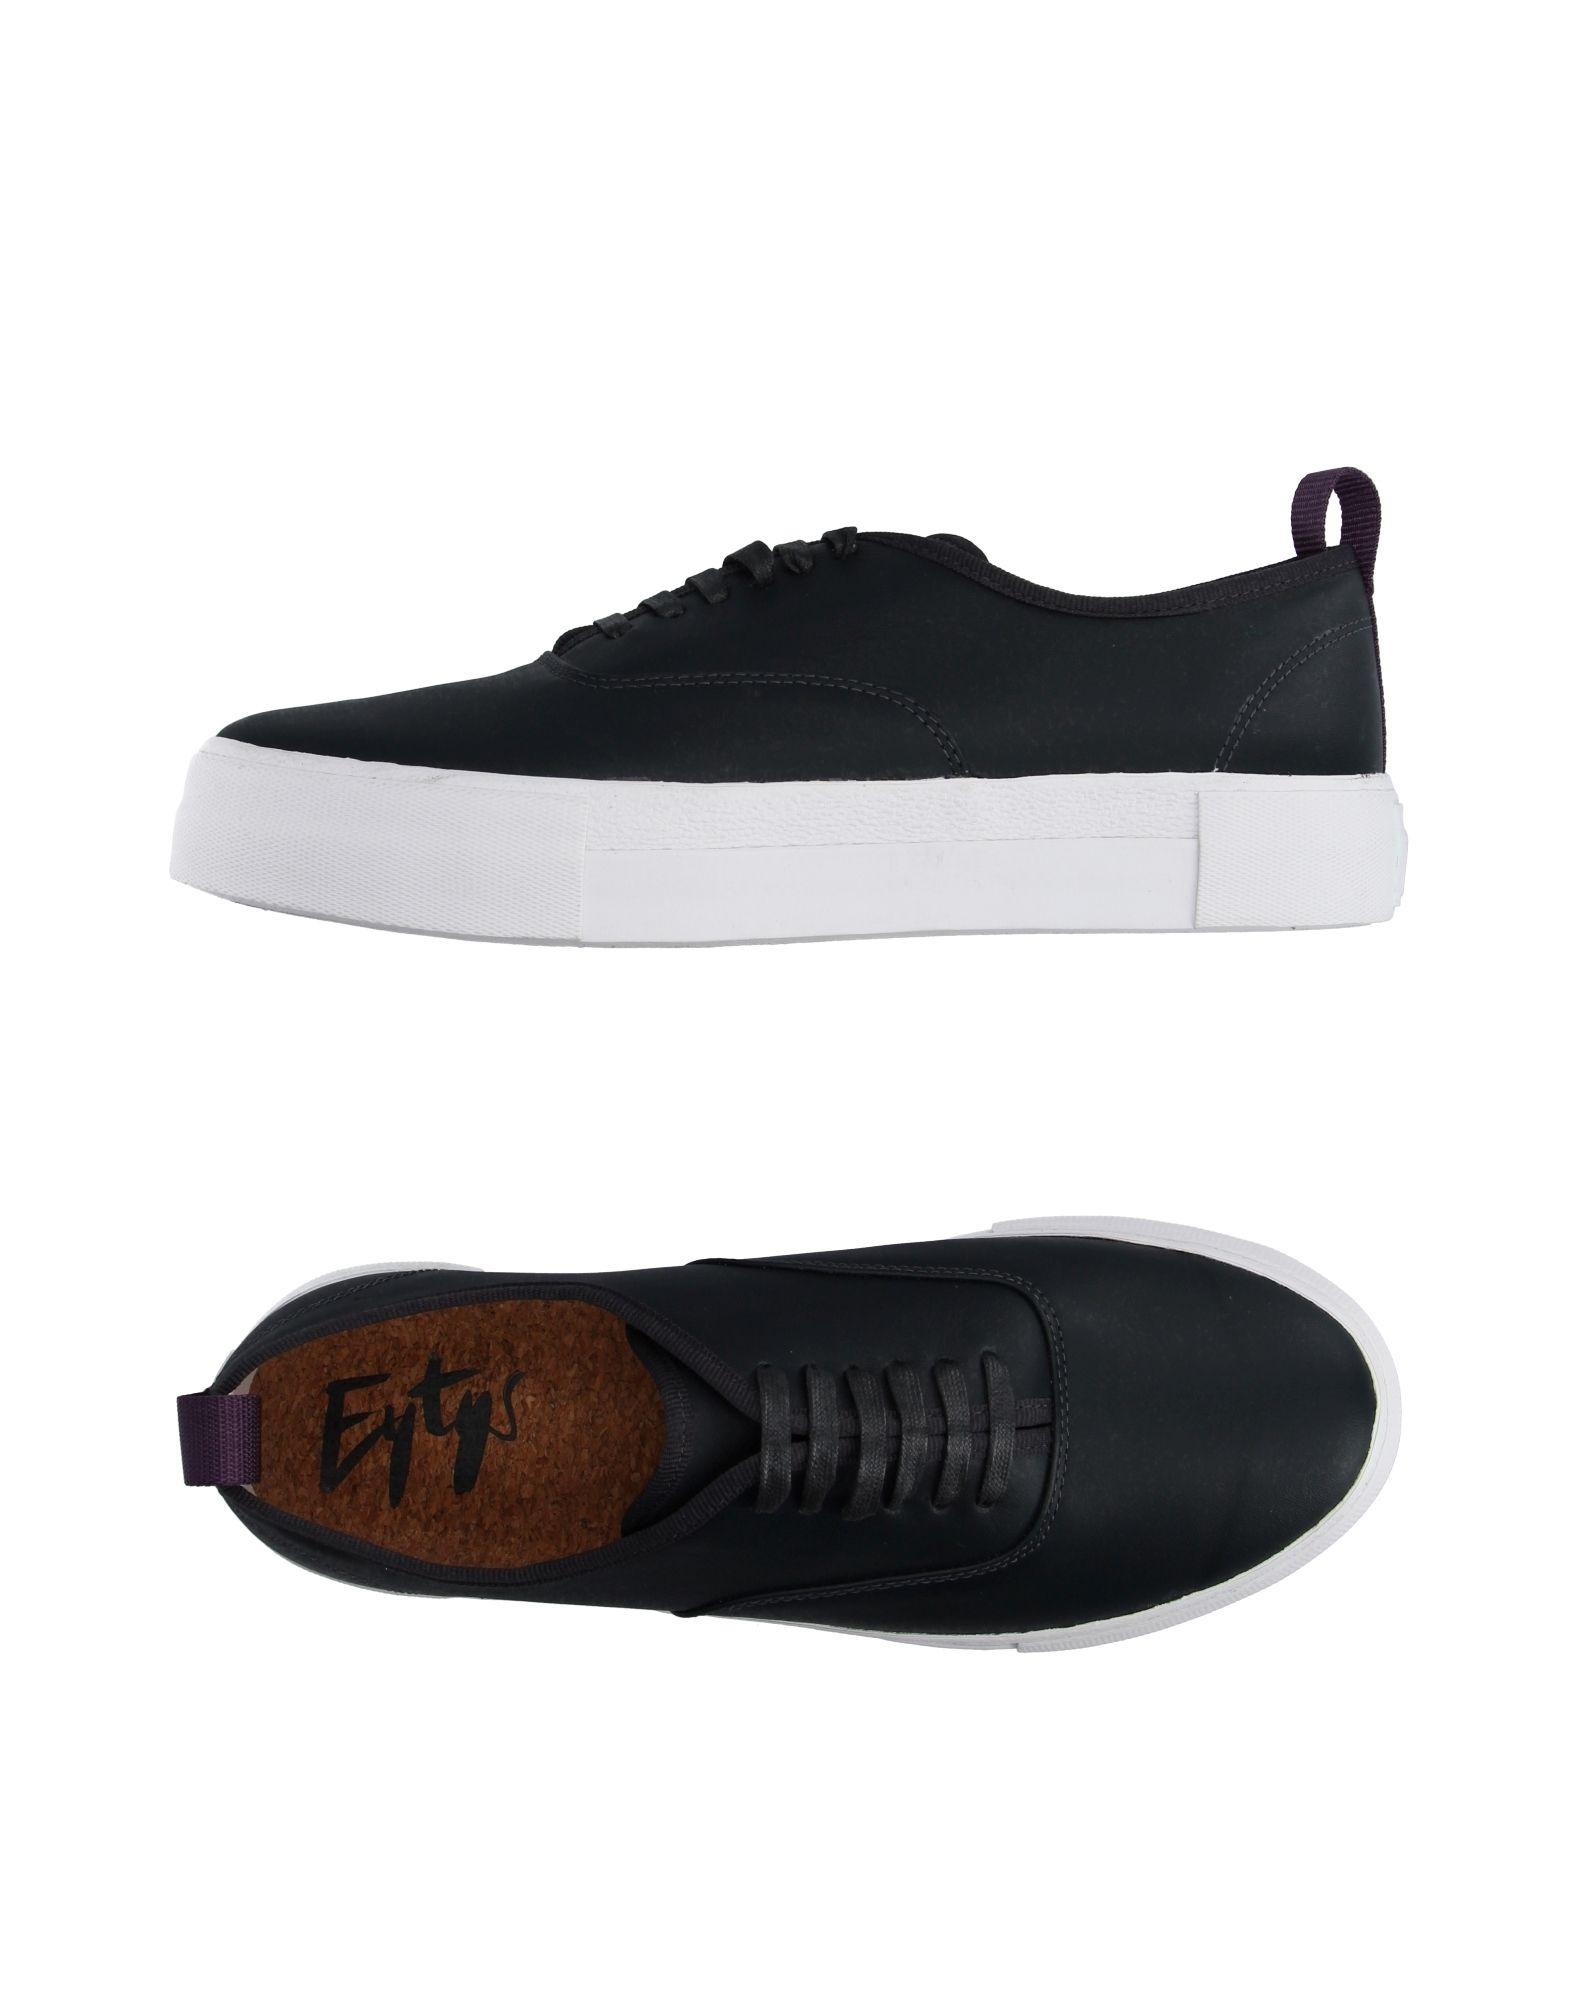 Eytys Sneakers Herren  11032090FR Gute Qualität beliebte Schuhe